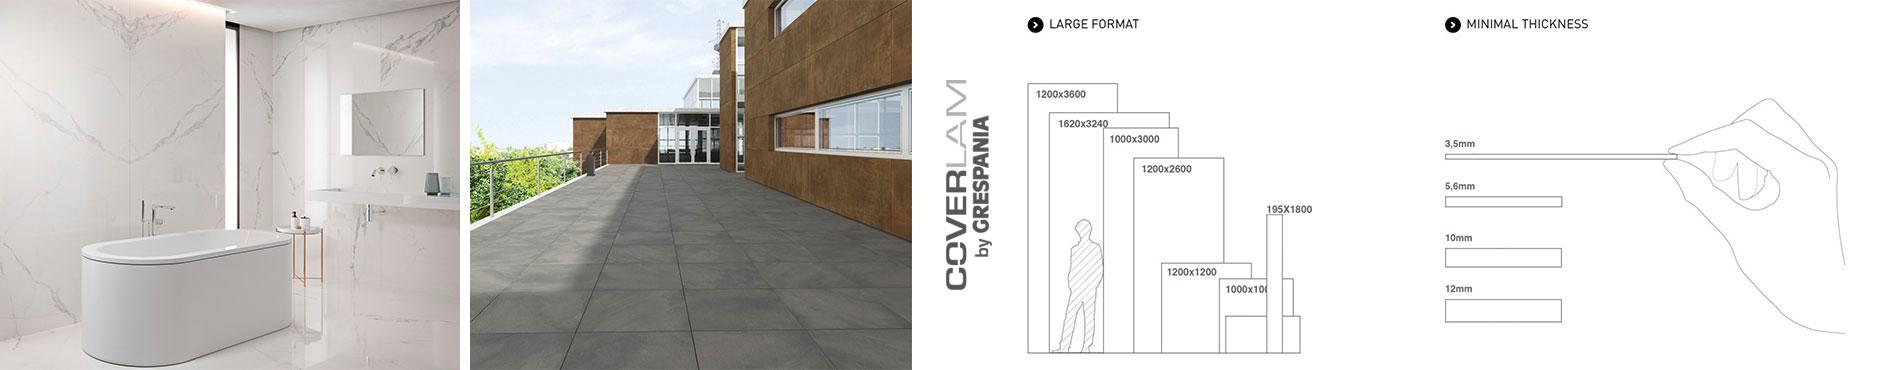 Coverlam Large Format